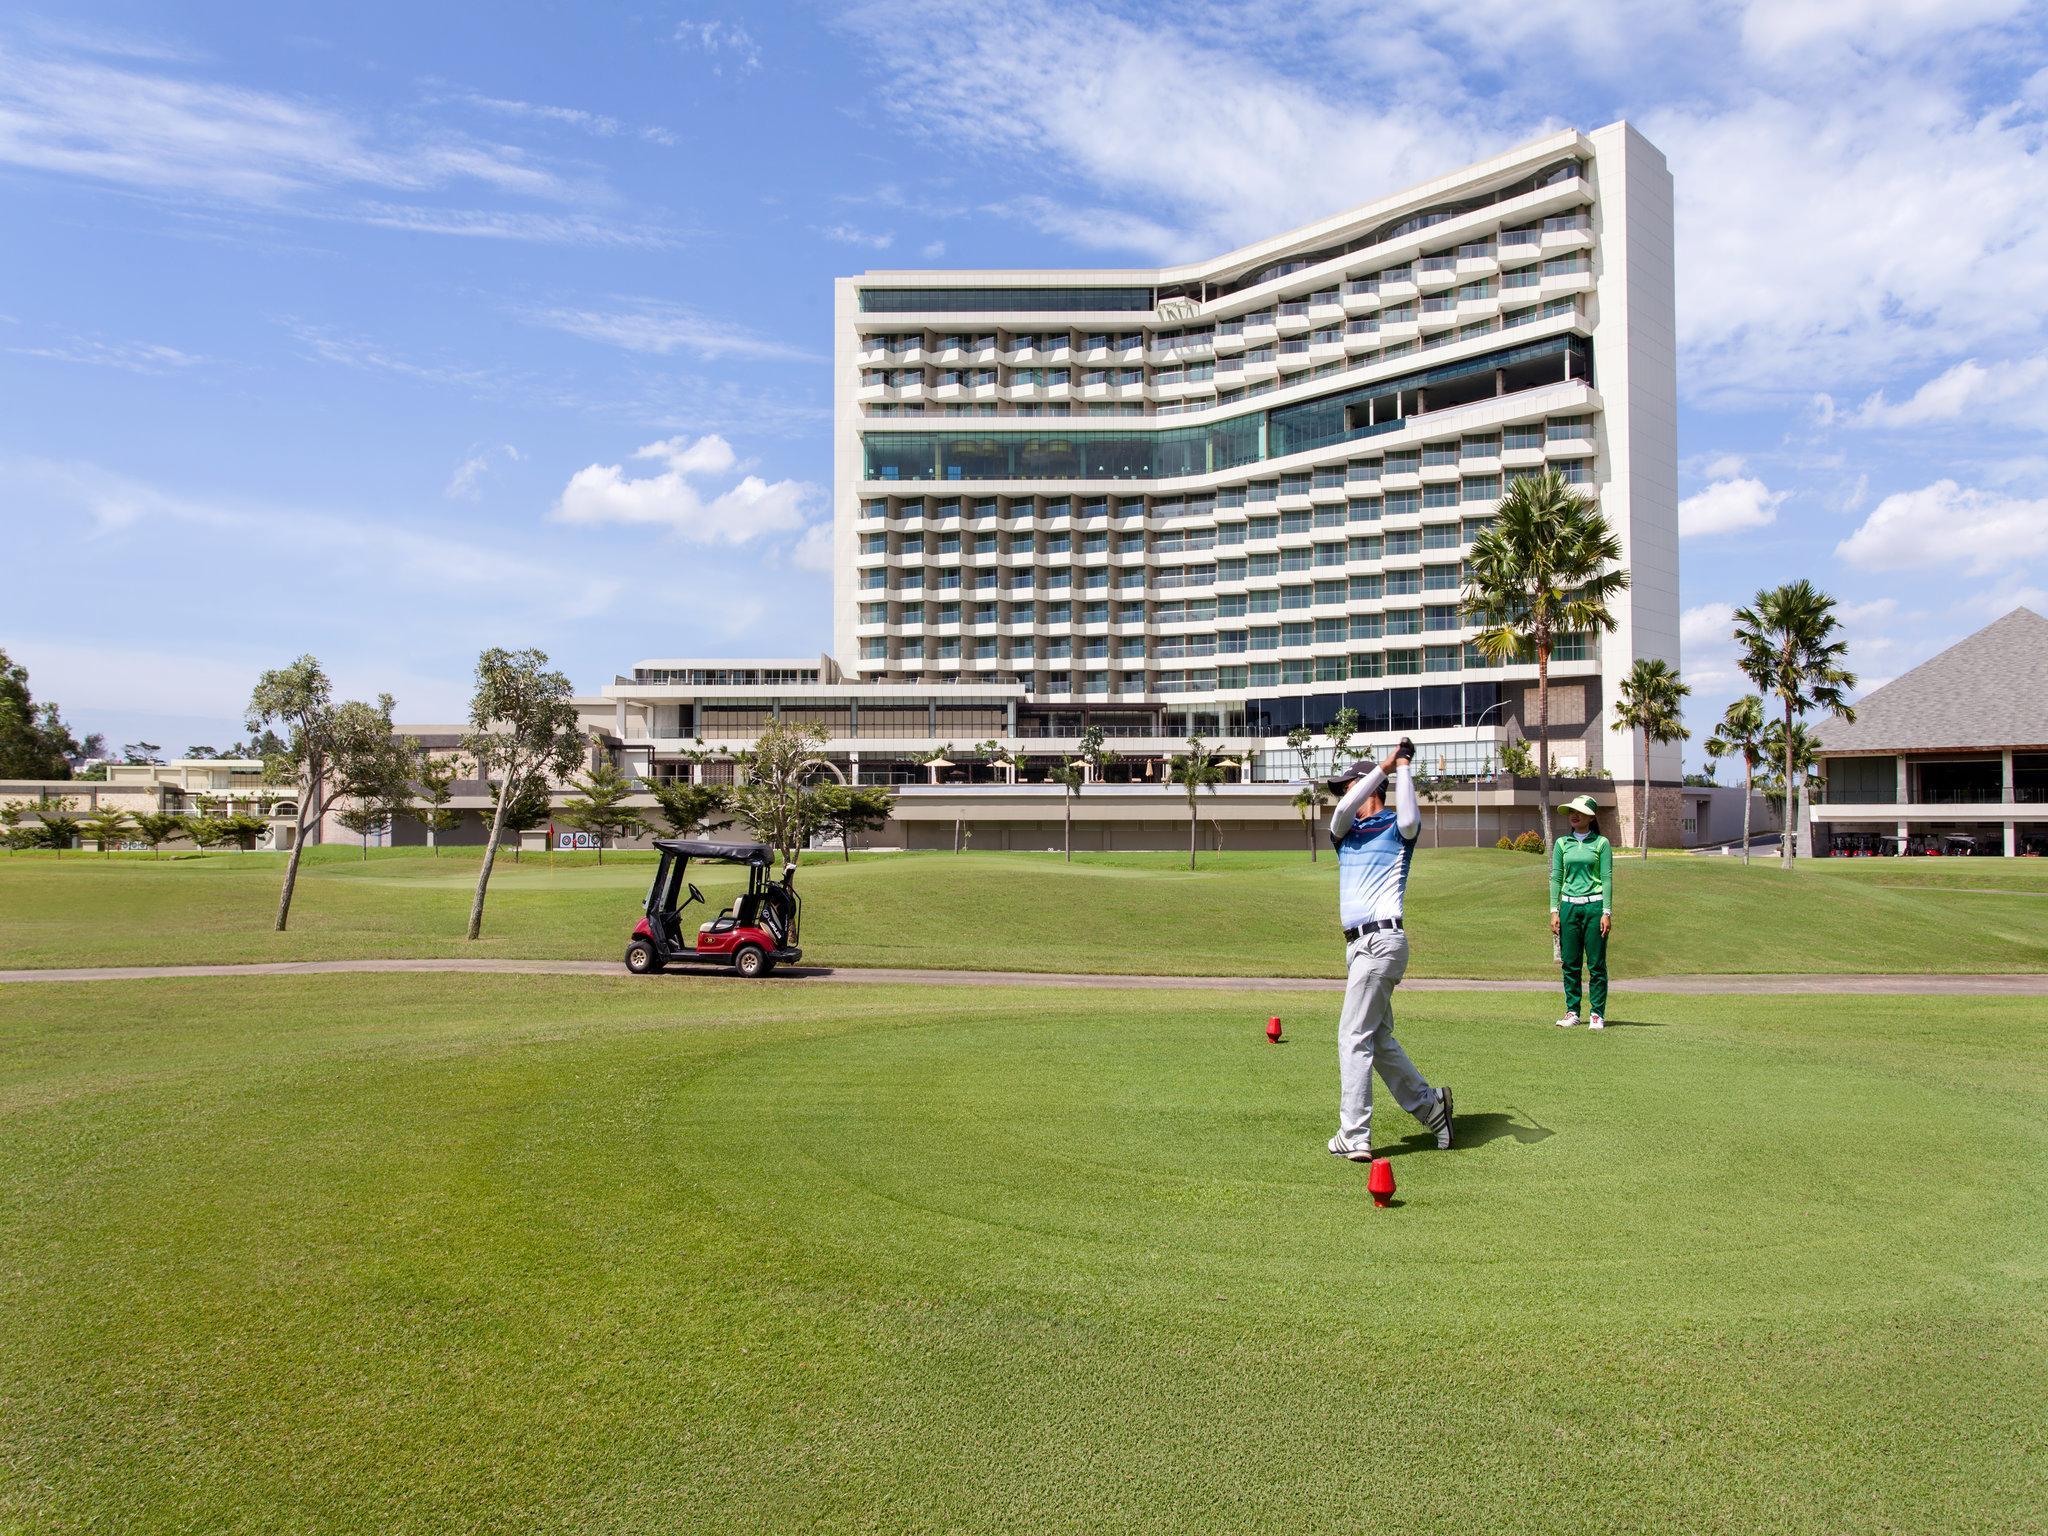 Radisson Golf and Convention Center Batam